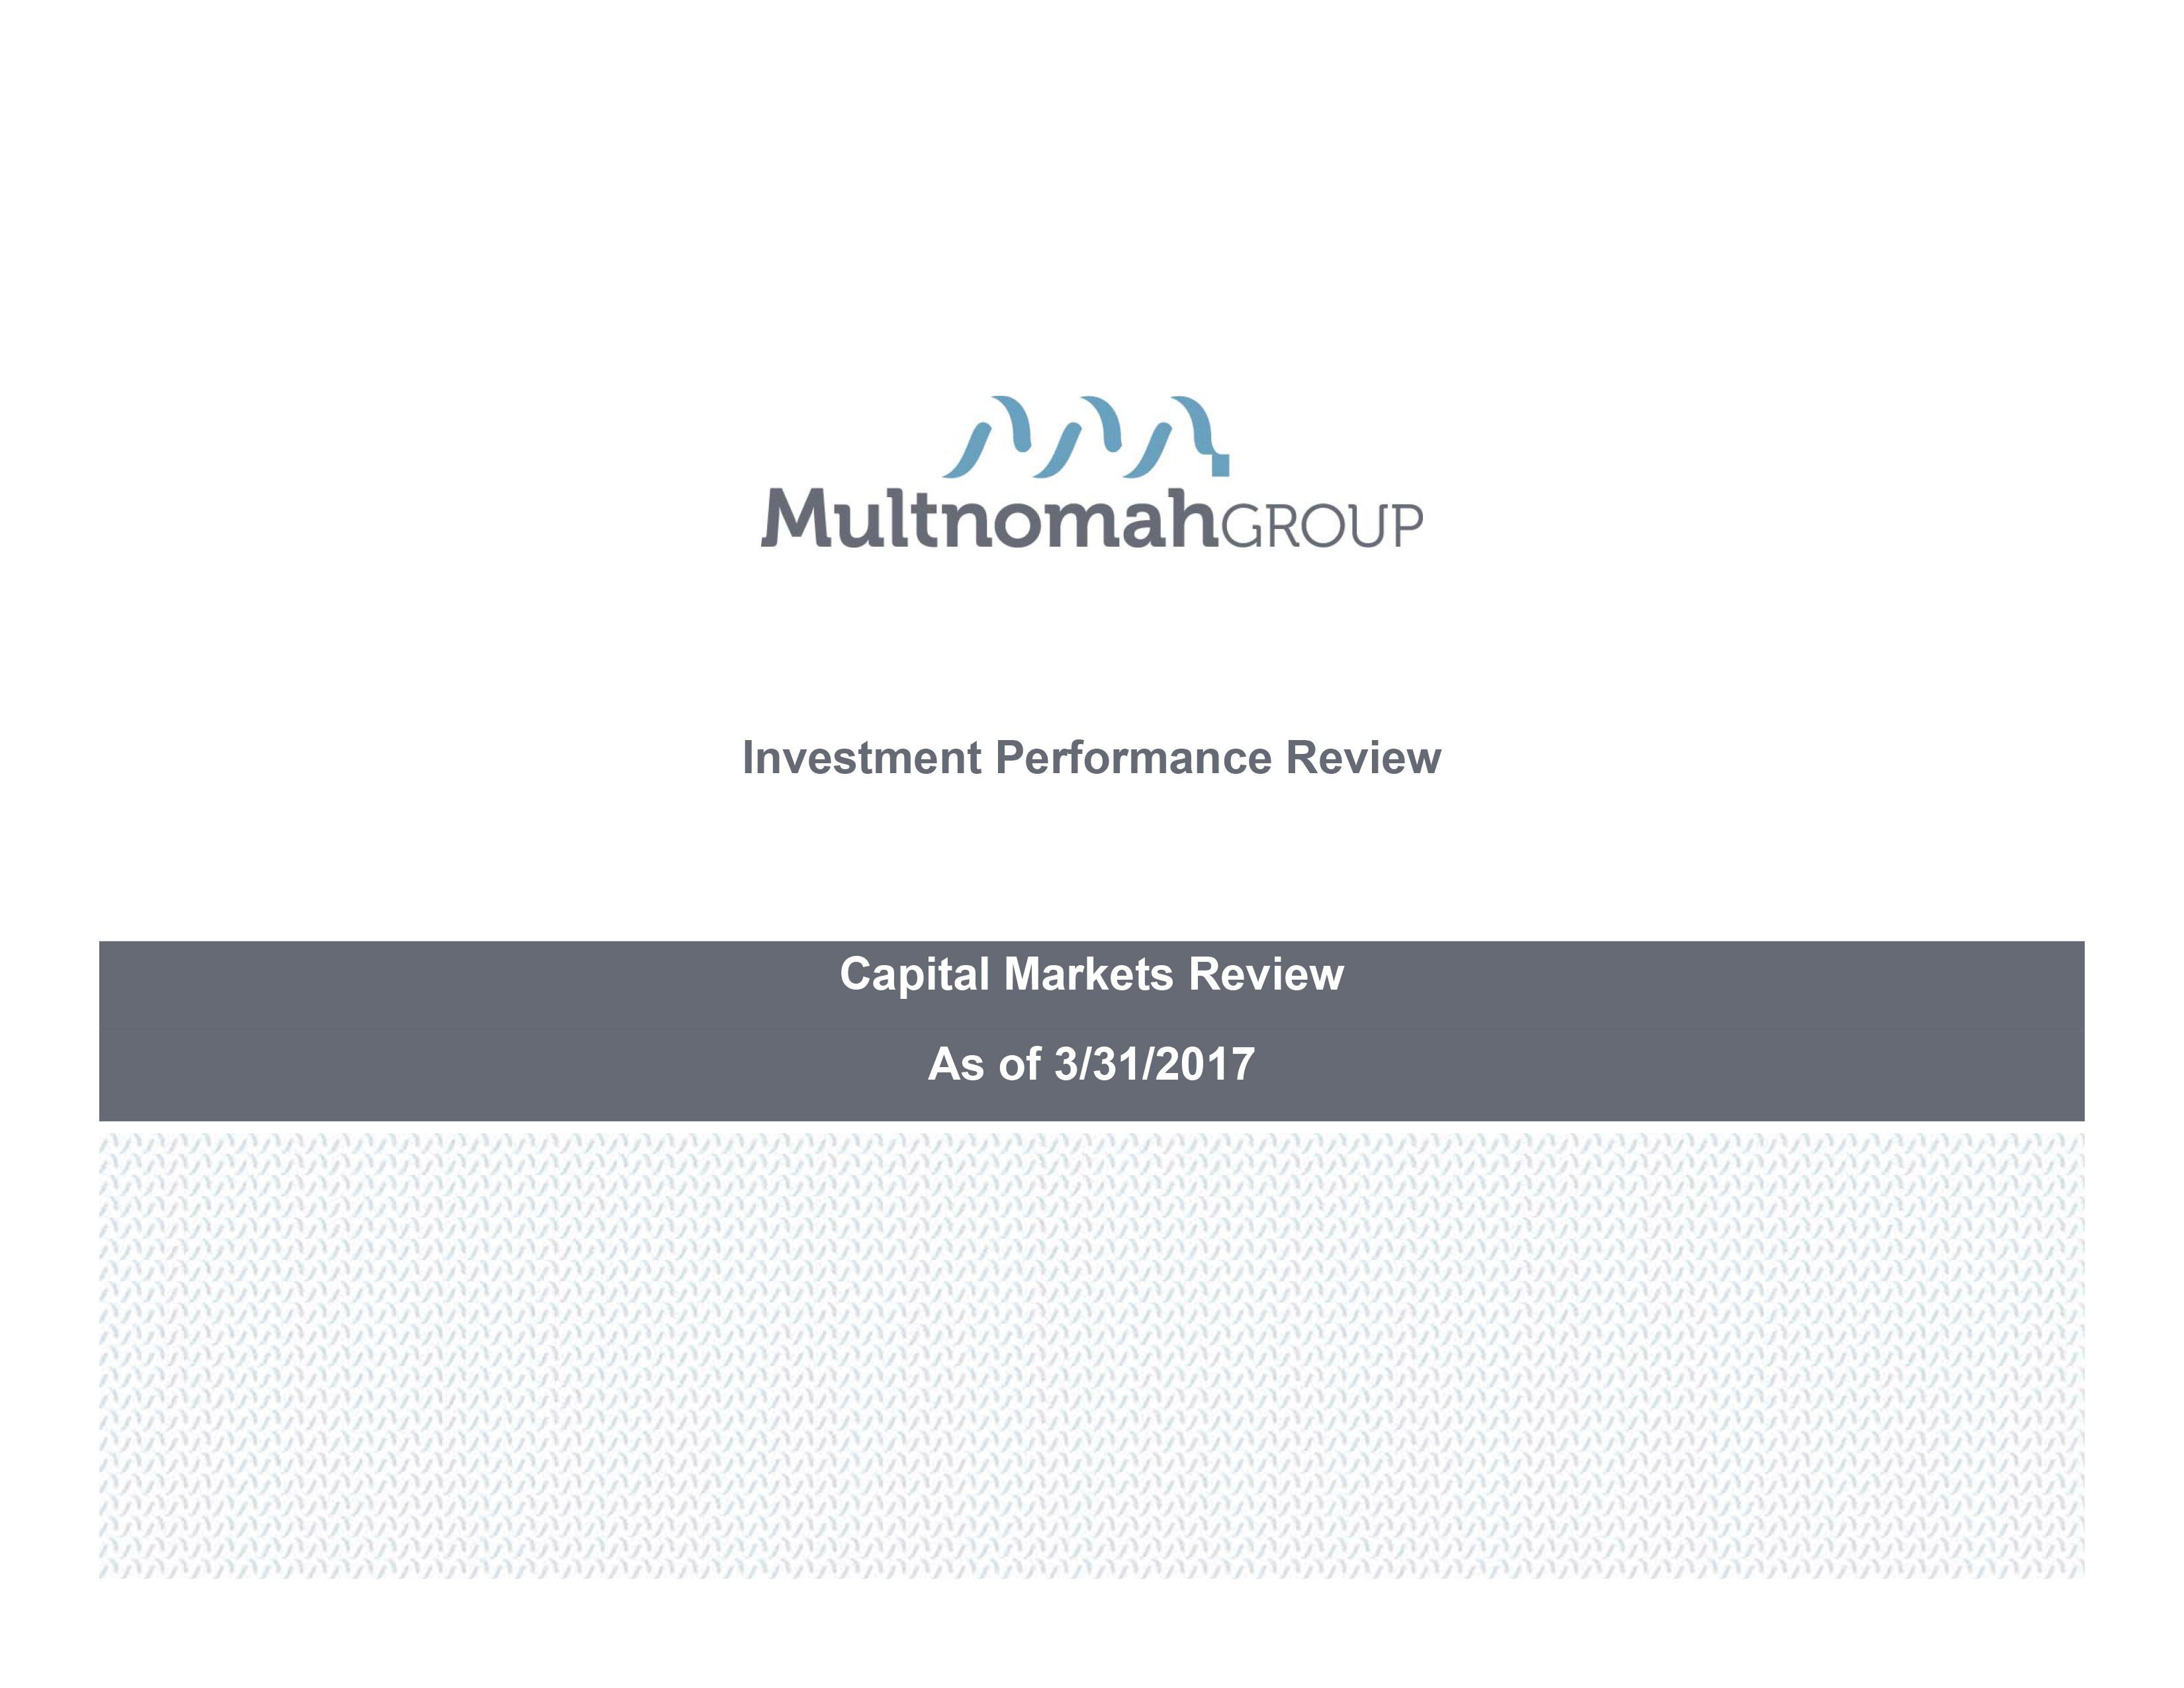 1Q_Market_Review_Image_2017.jpg